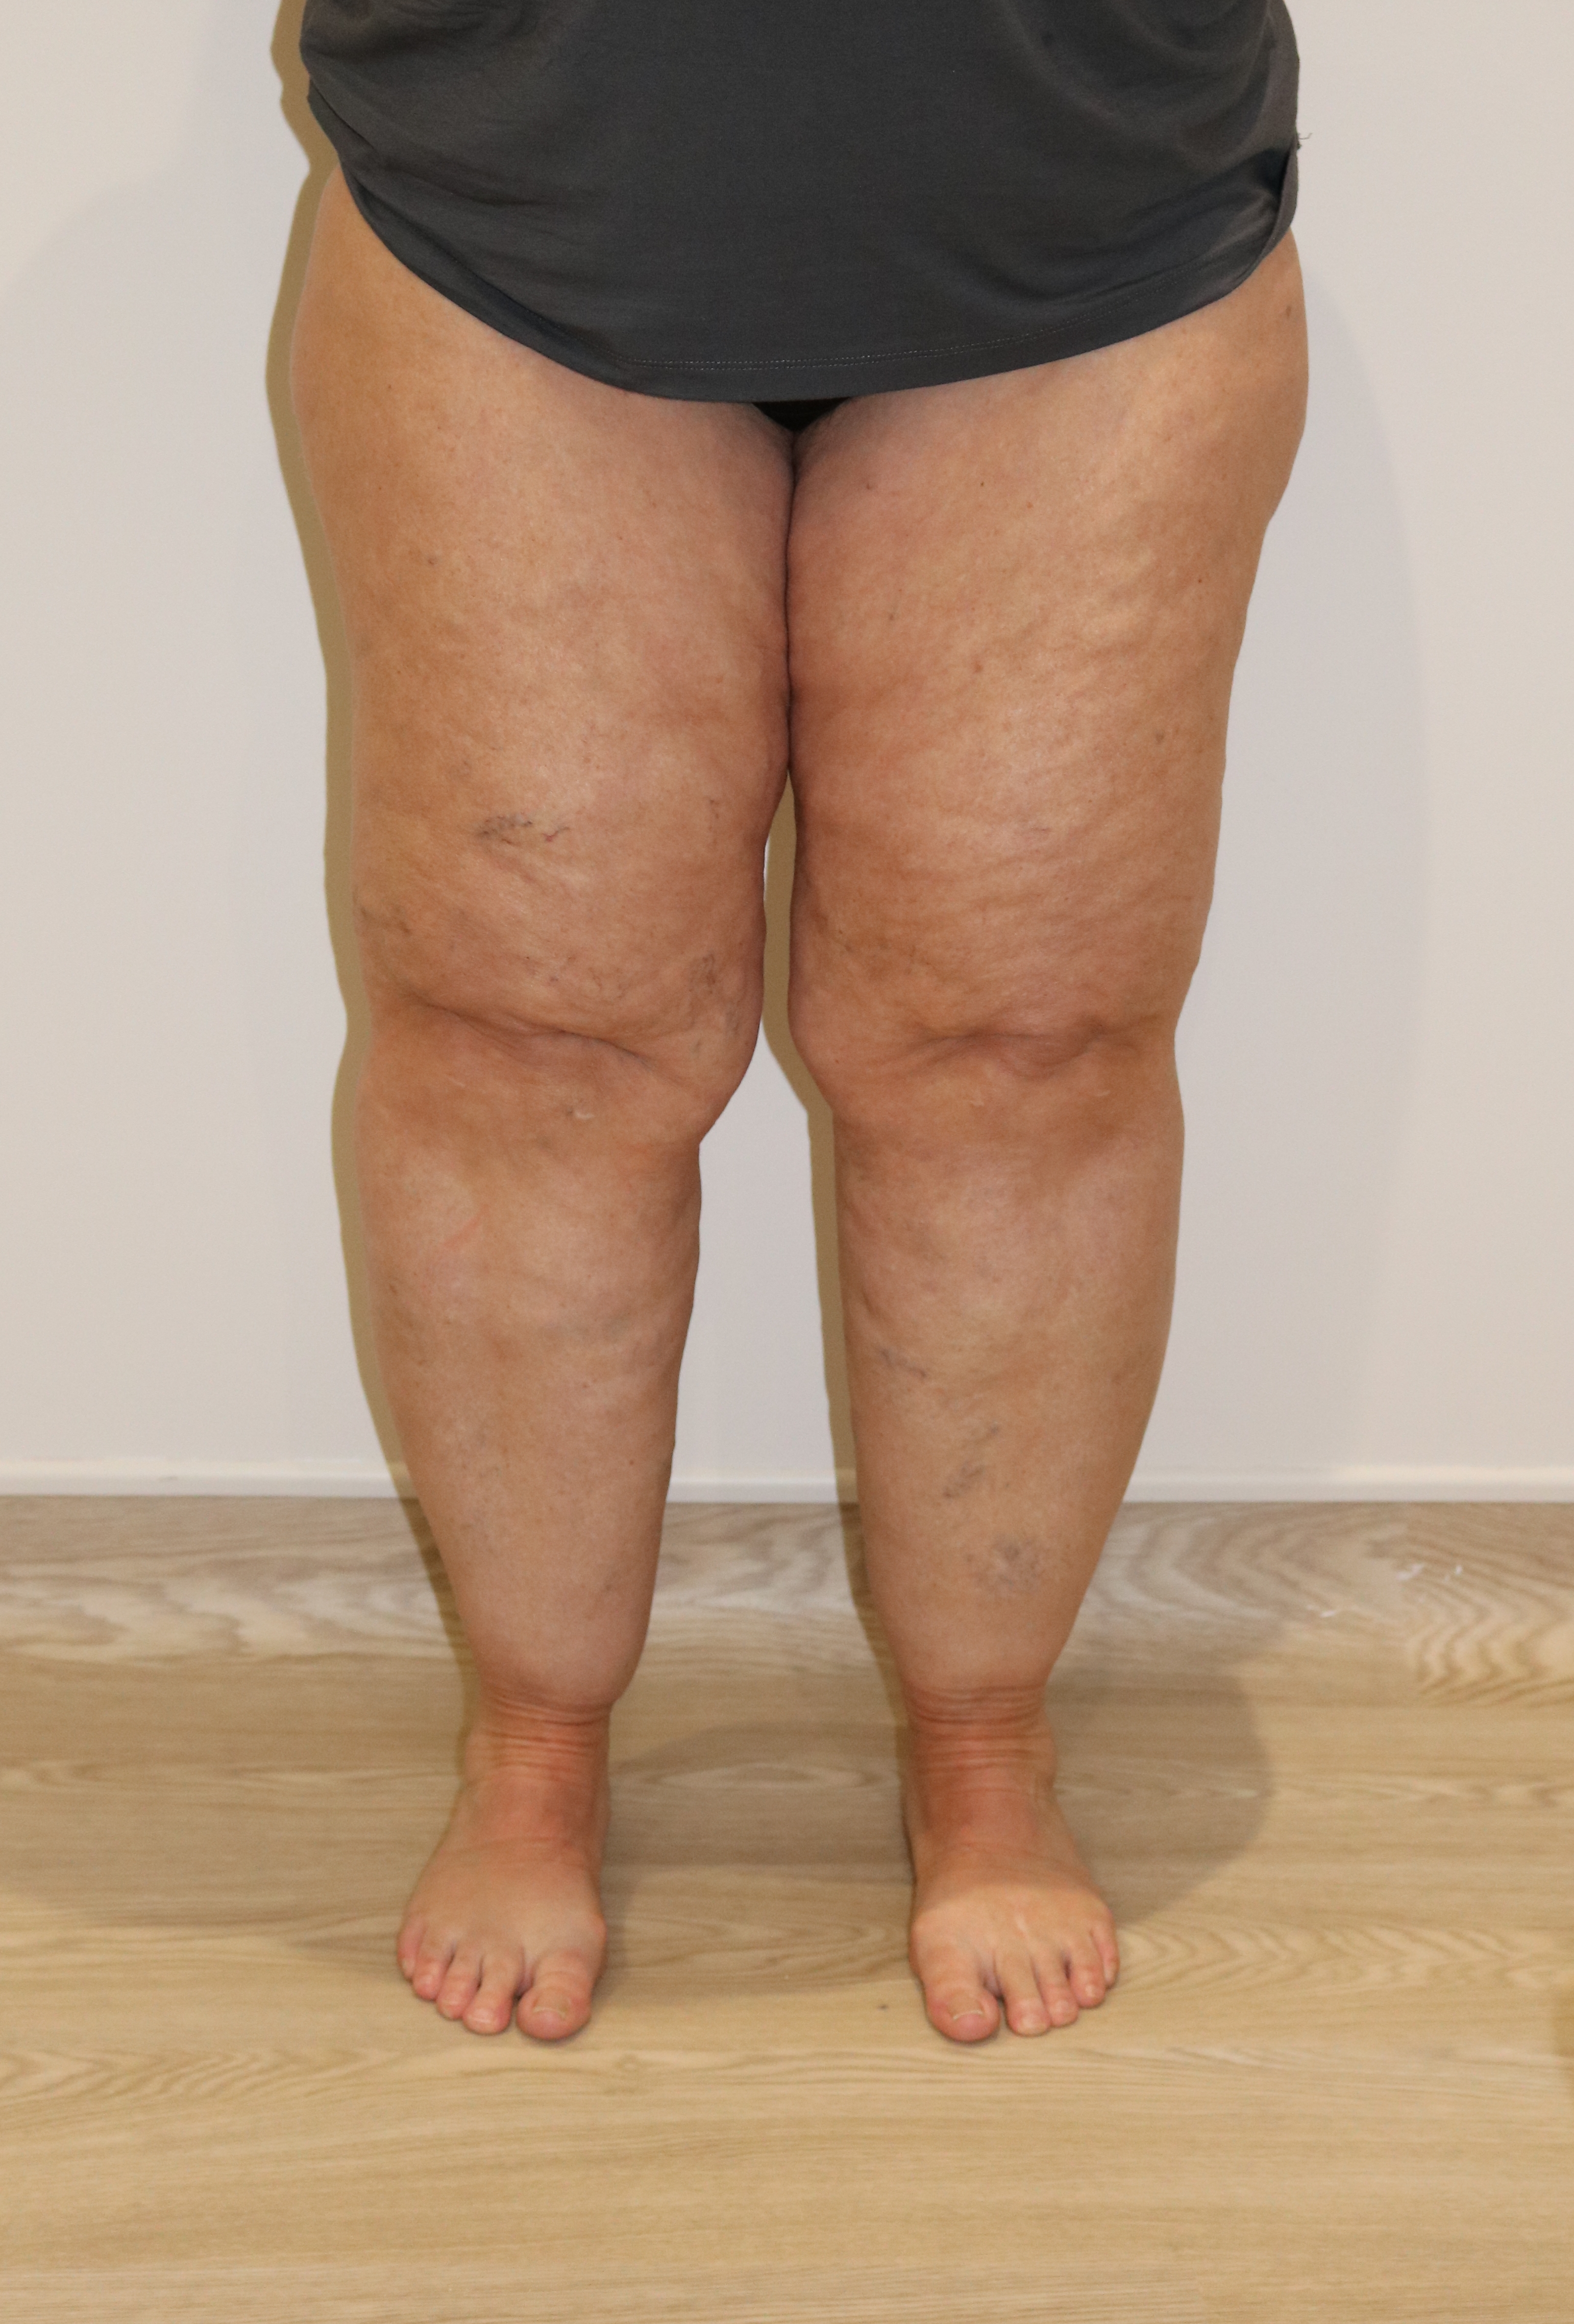 Liposuction (Liposculpture) | GloboMD